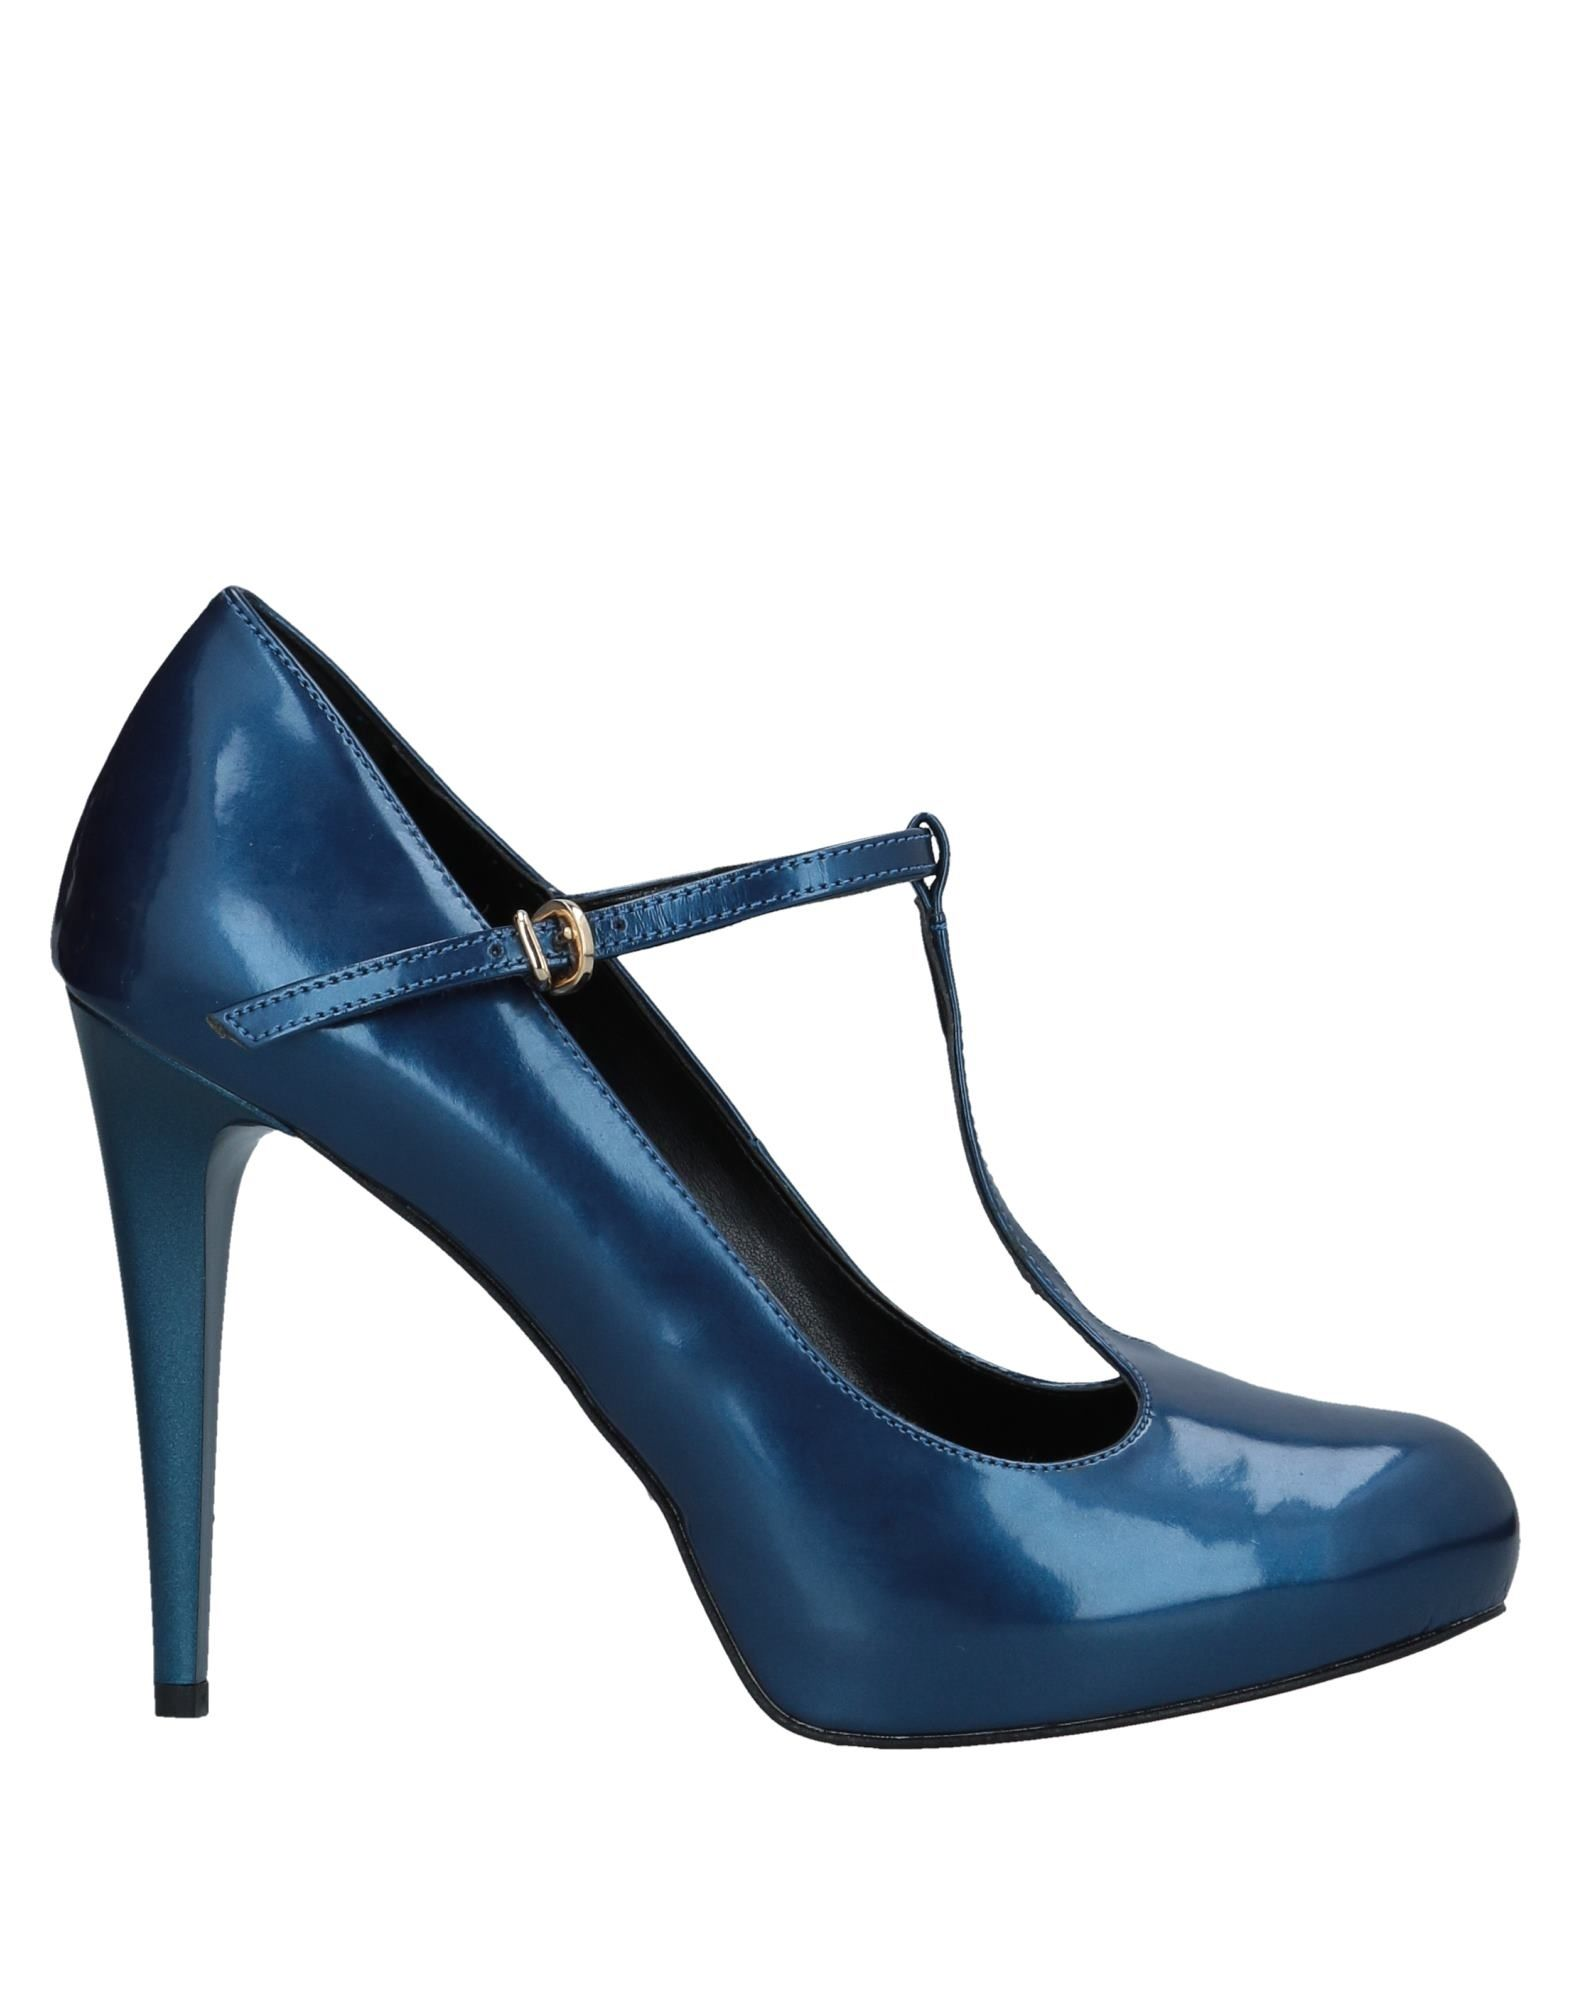 Cómodo y Zapato bien parecido Zapato y De Salón Tipe E Tacchi Mujer - Salones Tipe E Tacchi  Azul oscuro b1a8b9